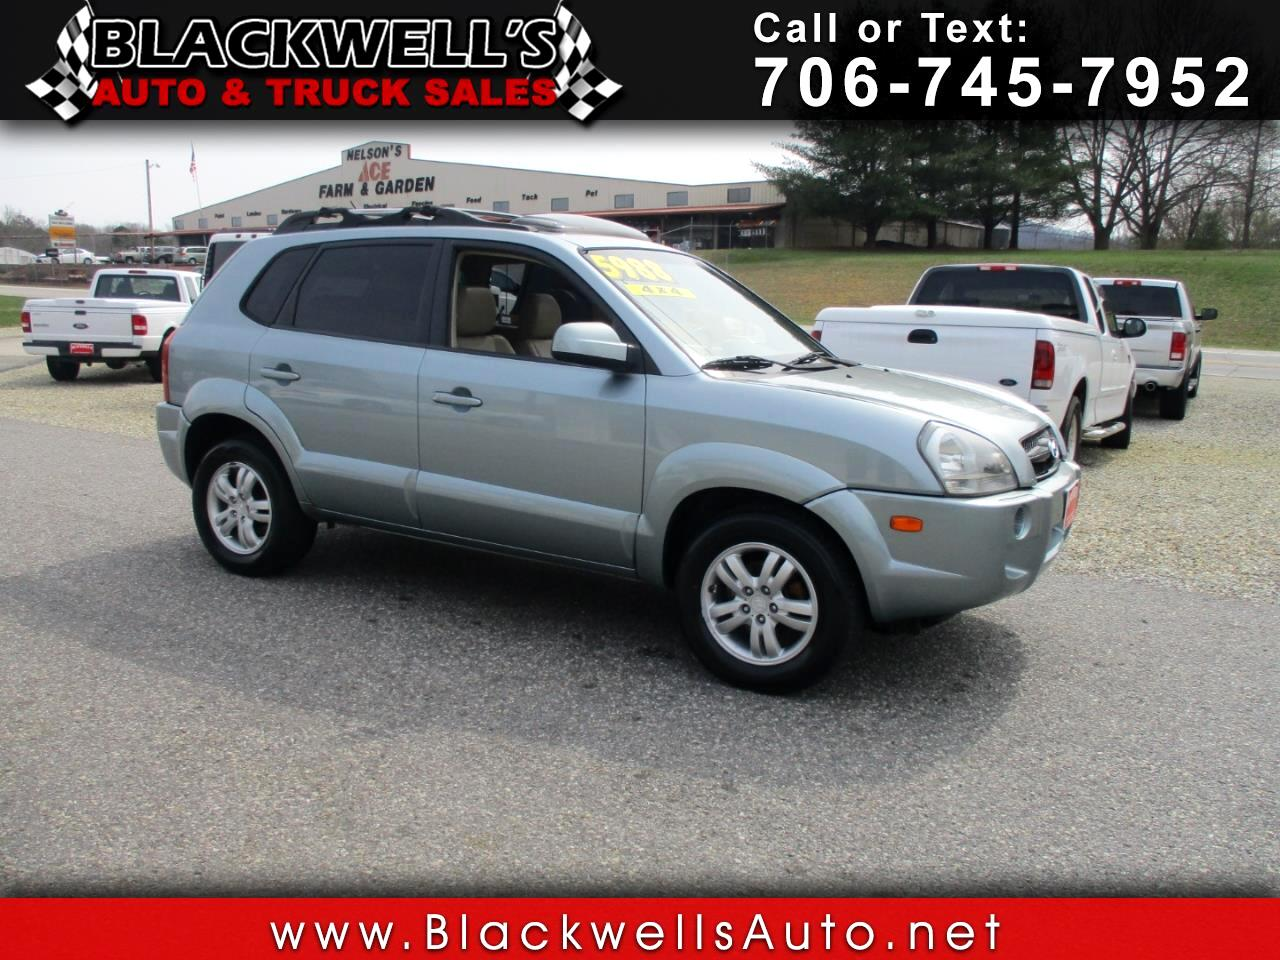 2006 Hyundai Tucson 4dr Limited 4WD 2.7L V6 Auto